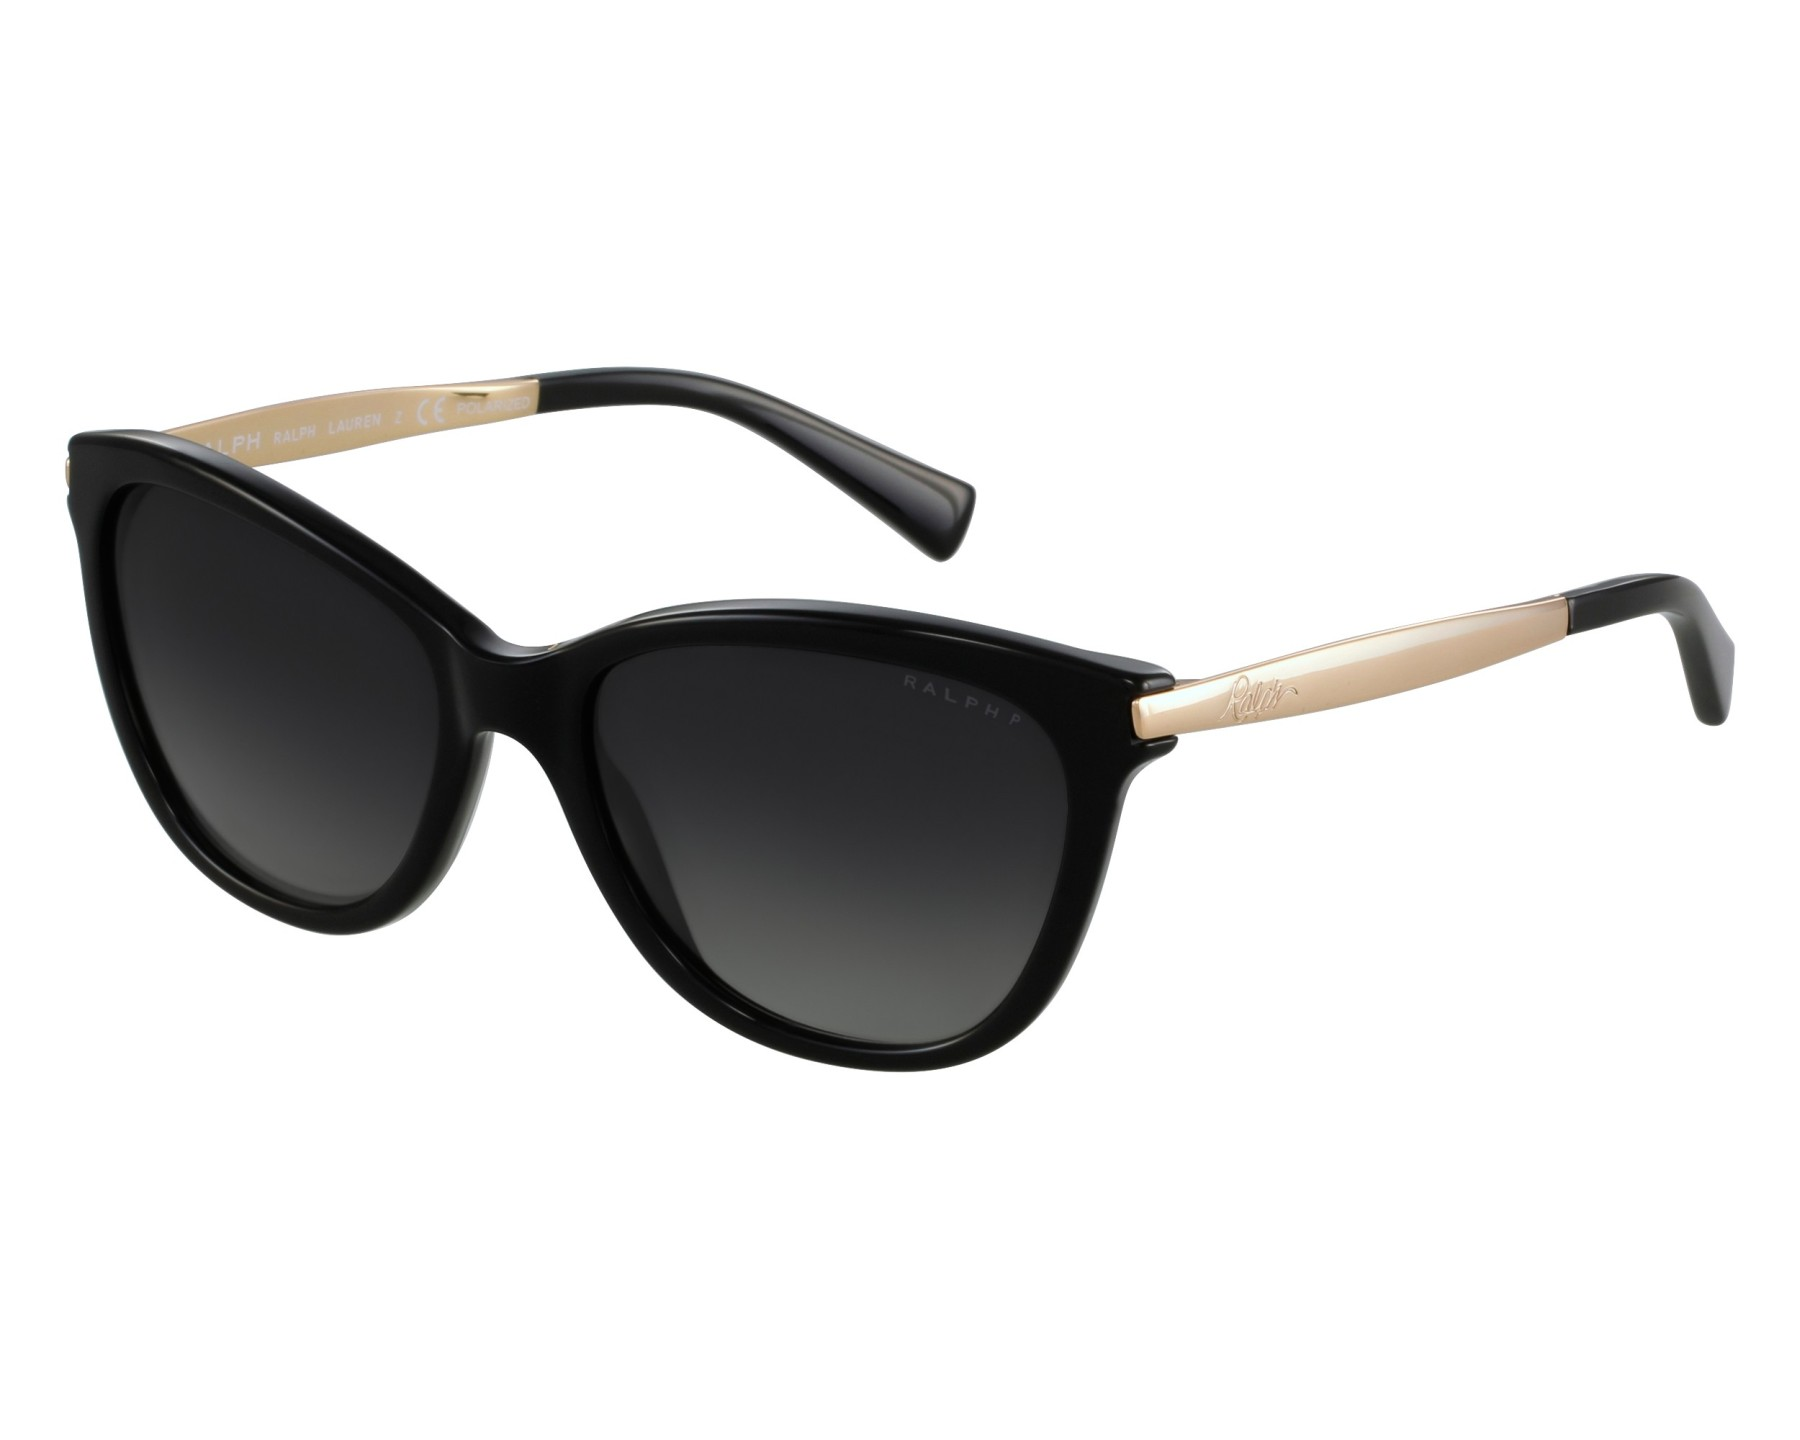 1f81532c13 Sunglasses Ralph Lauren RA-5201 1265 T3 54-17 Black Gold front view